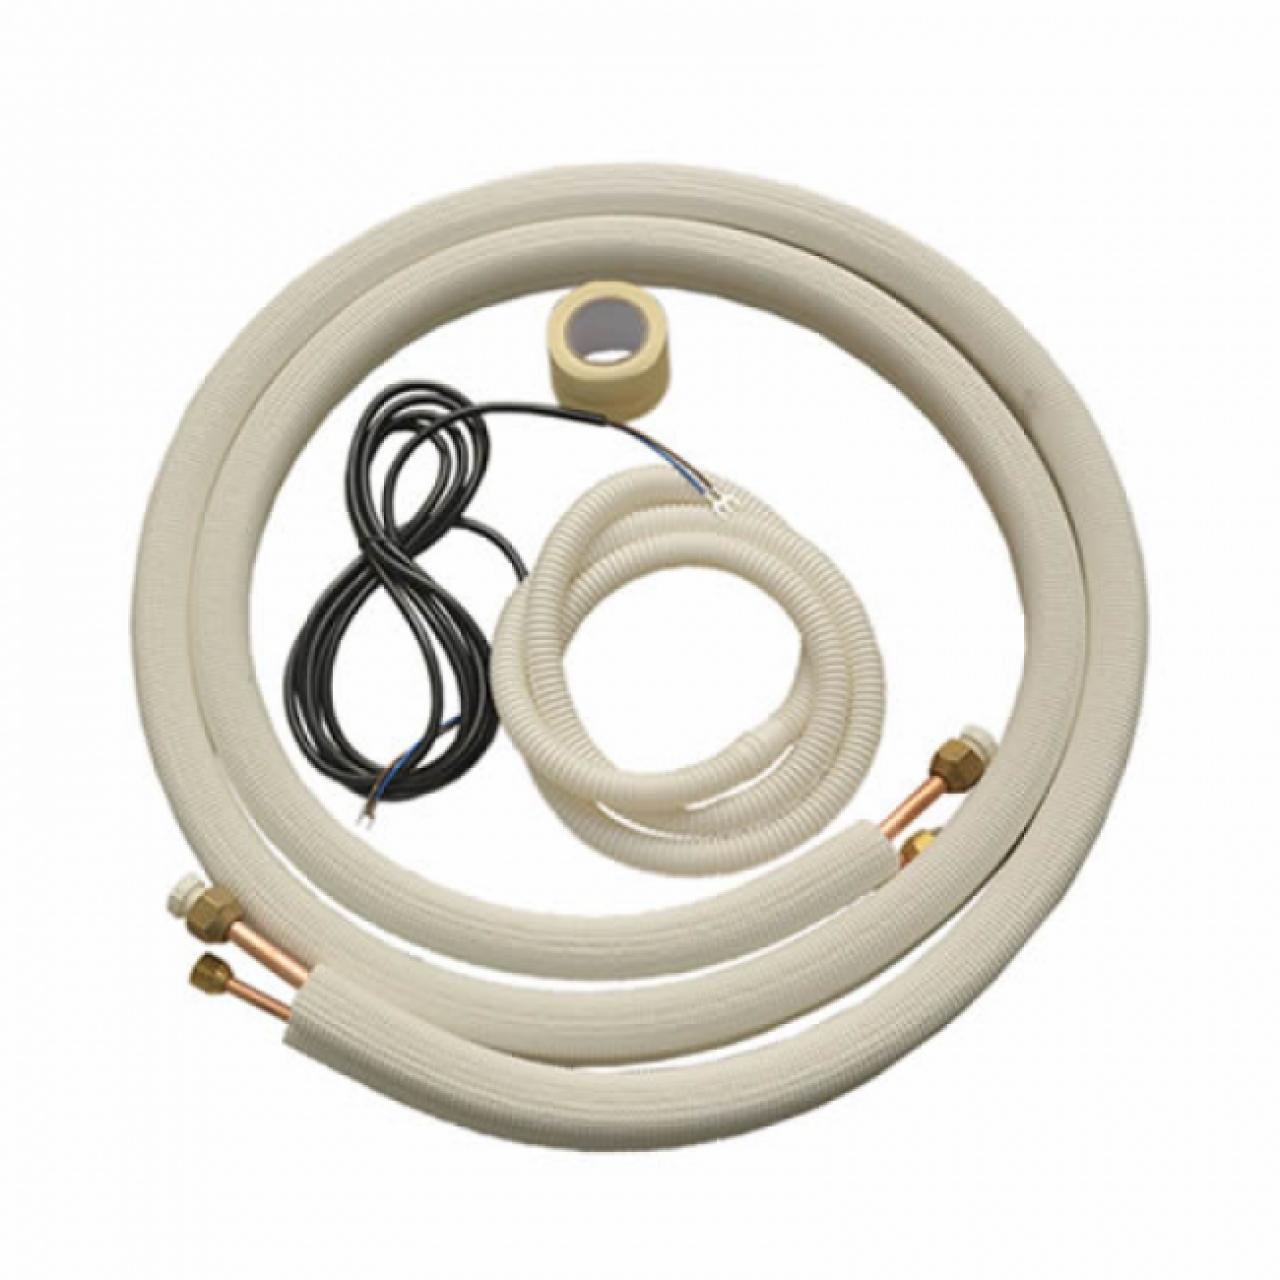 Haier Thermocool Split Air Conditioner Installation Kit 1